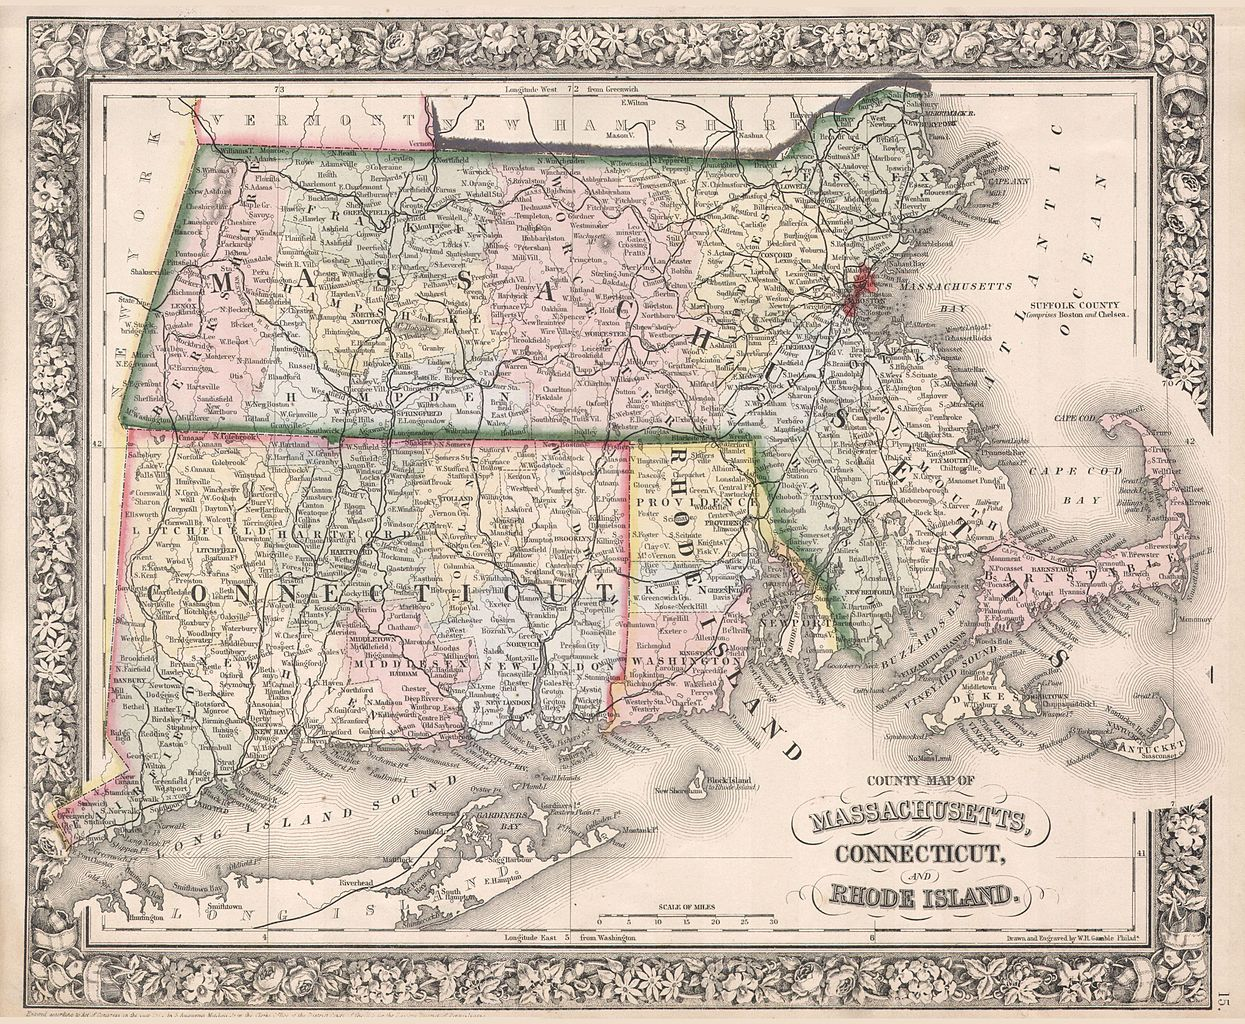 Rhode Island Birth Certificate Damian A Ranaldi